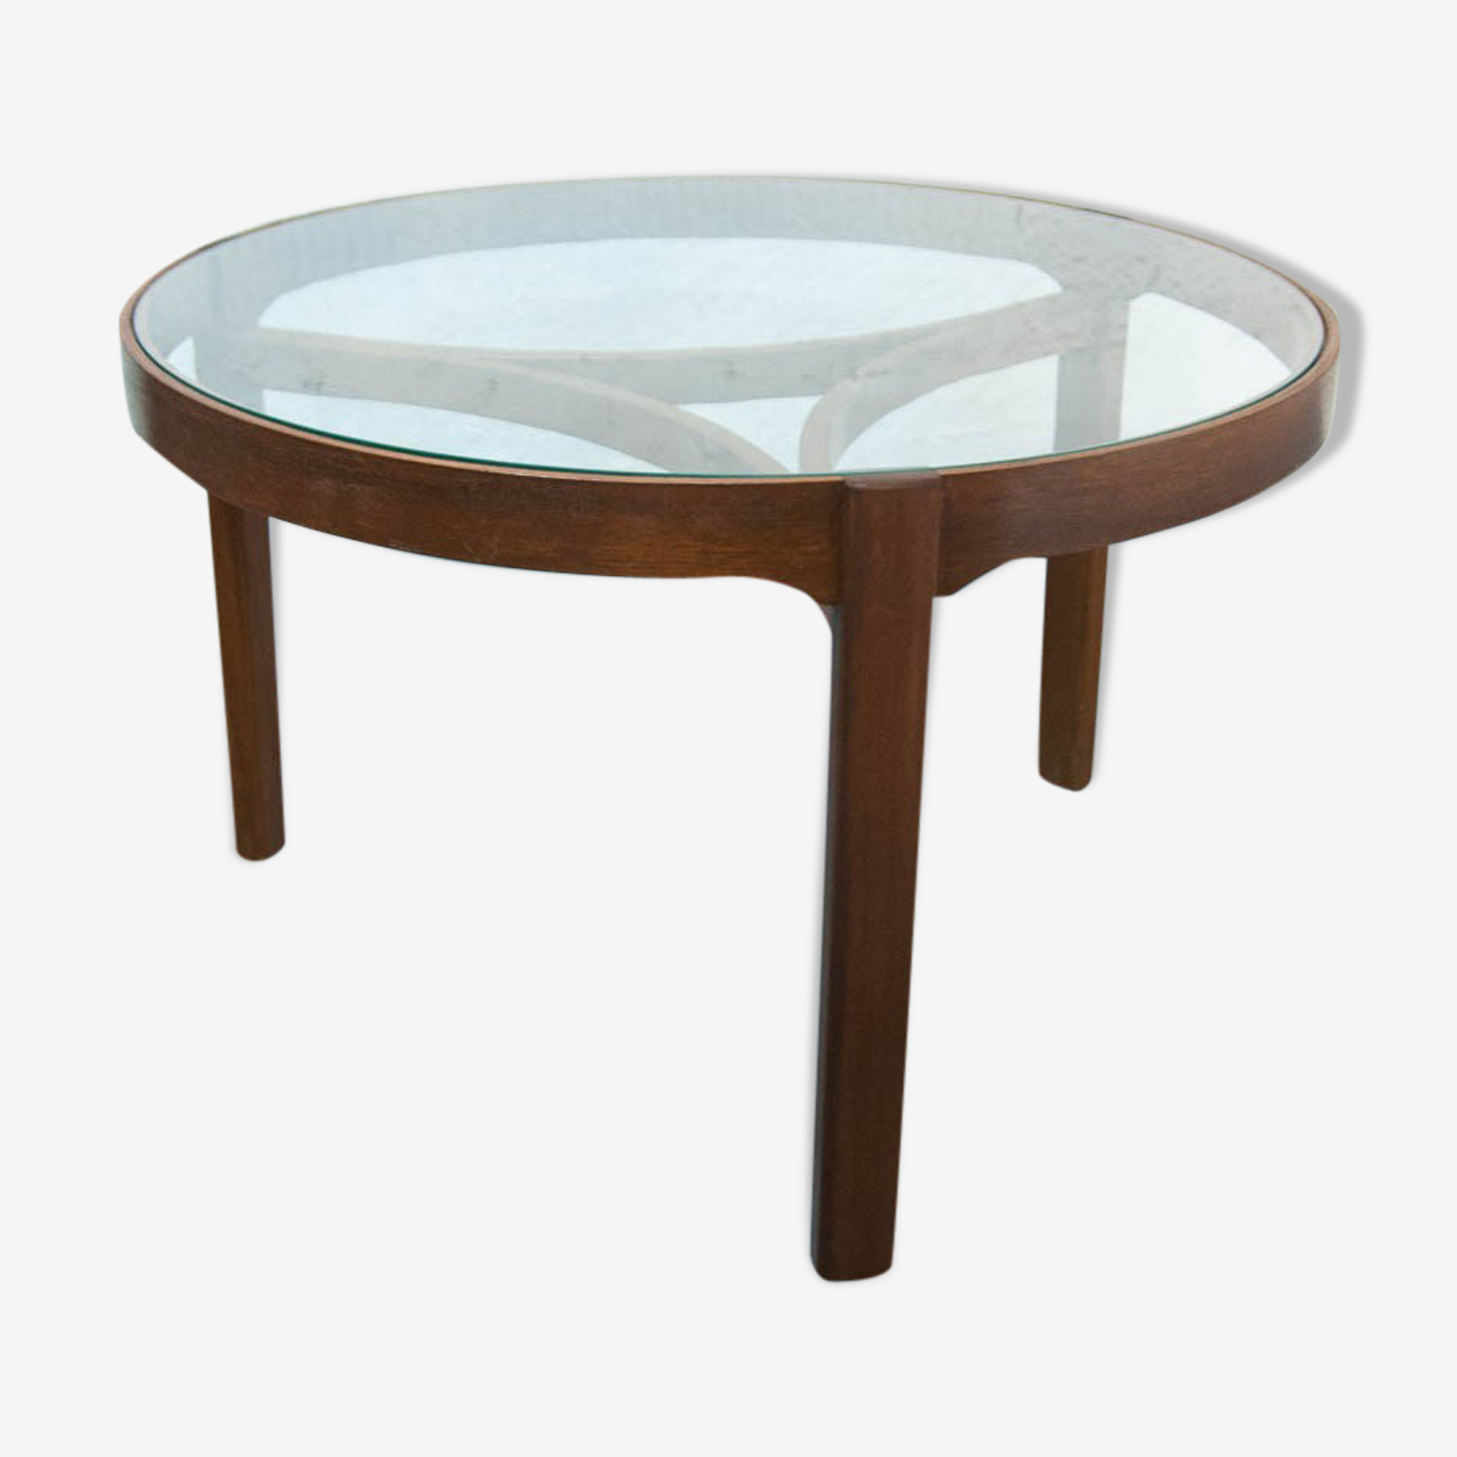 Table basse tripode vitrée 82cm